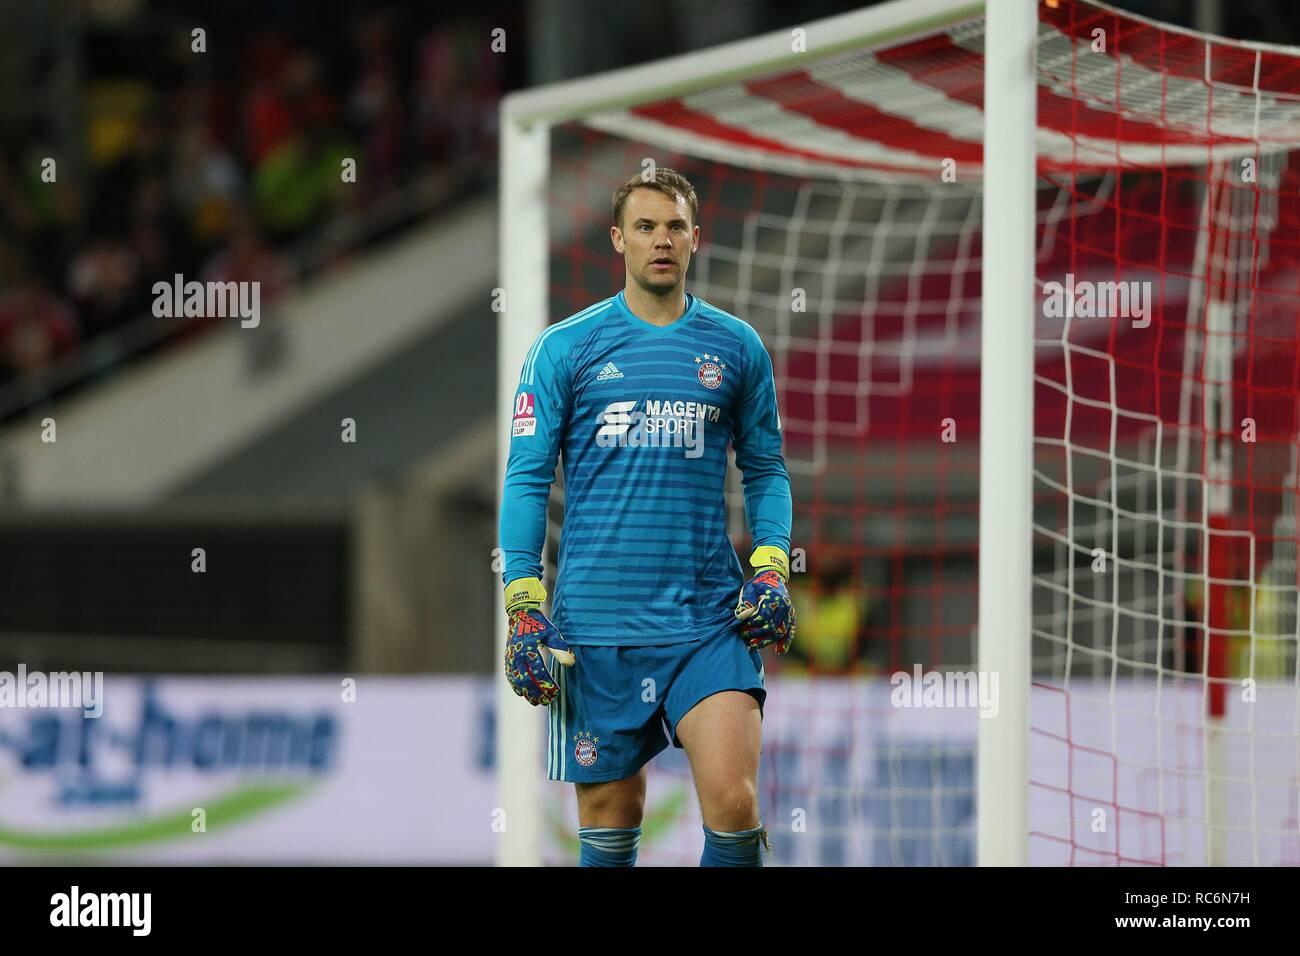 firo: 13.01.2019, football, 1.Bundesliga, season 2018/2019, Telekom-Cup 2019, Bayern Munich goalkeeper Manuel NEUER, half figure   usage worldwide - Stock Image